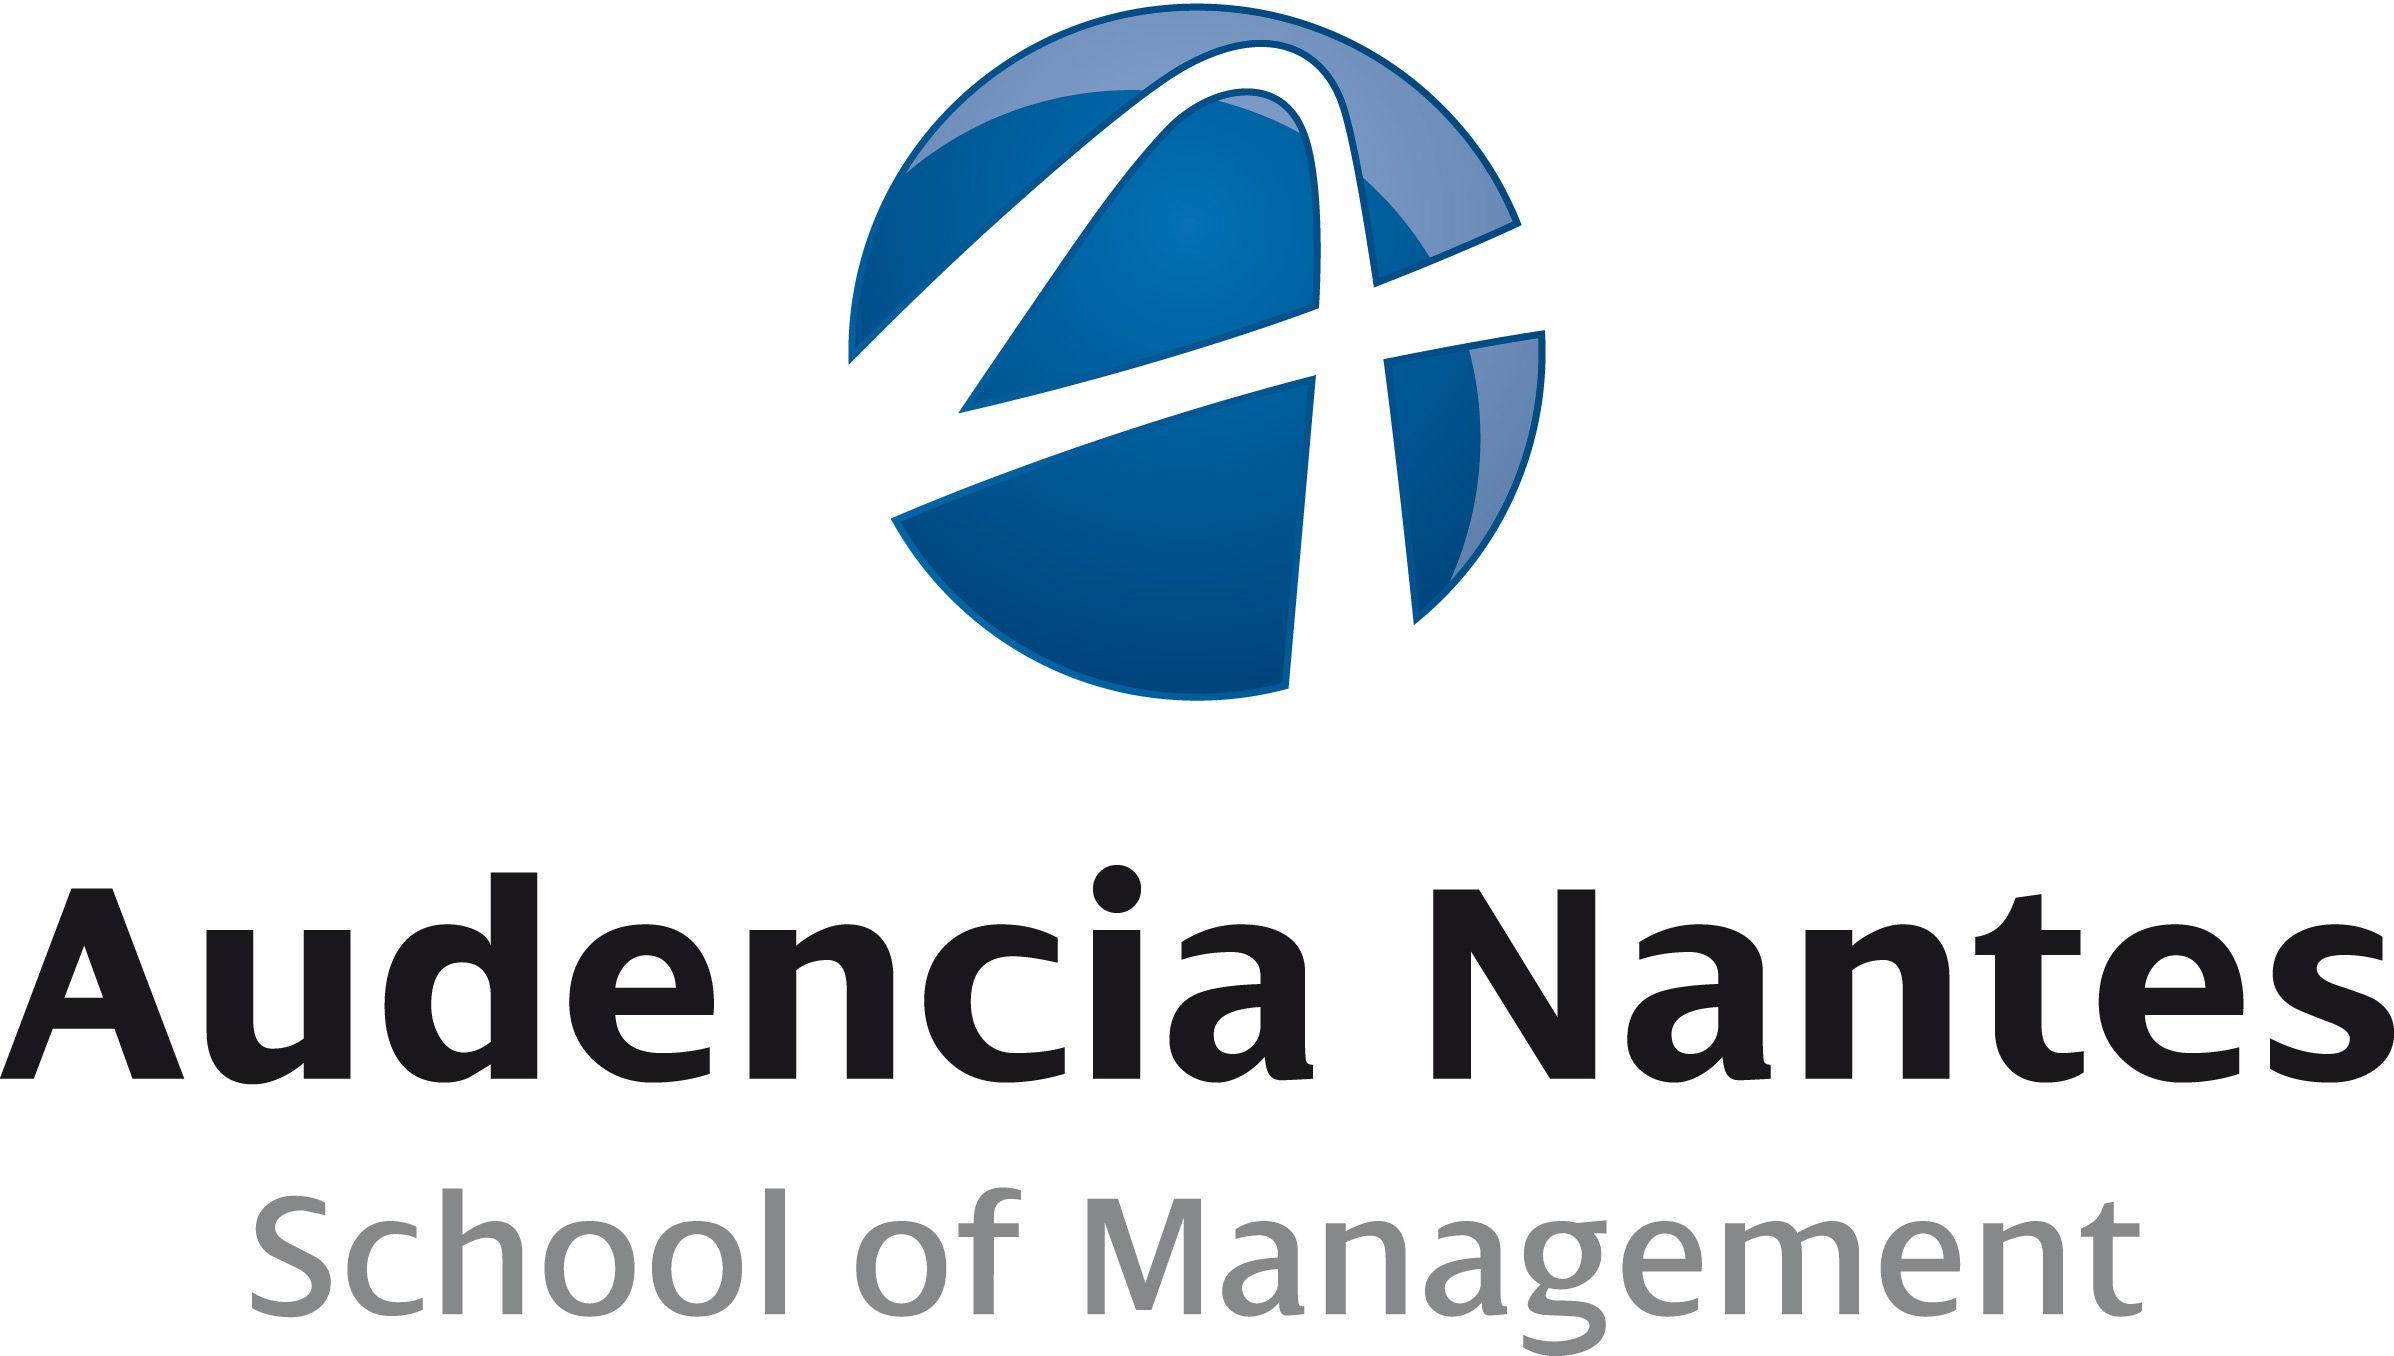 Logo Audencia Nantes, School of Management Audencia